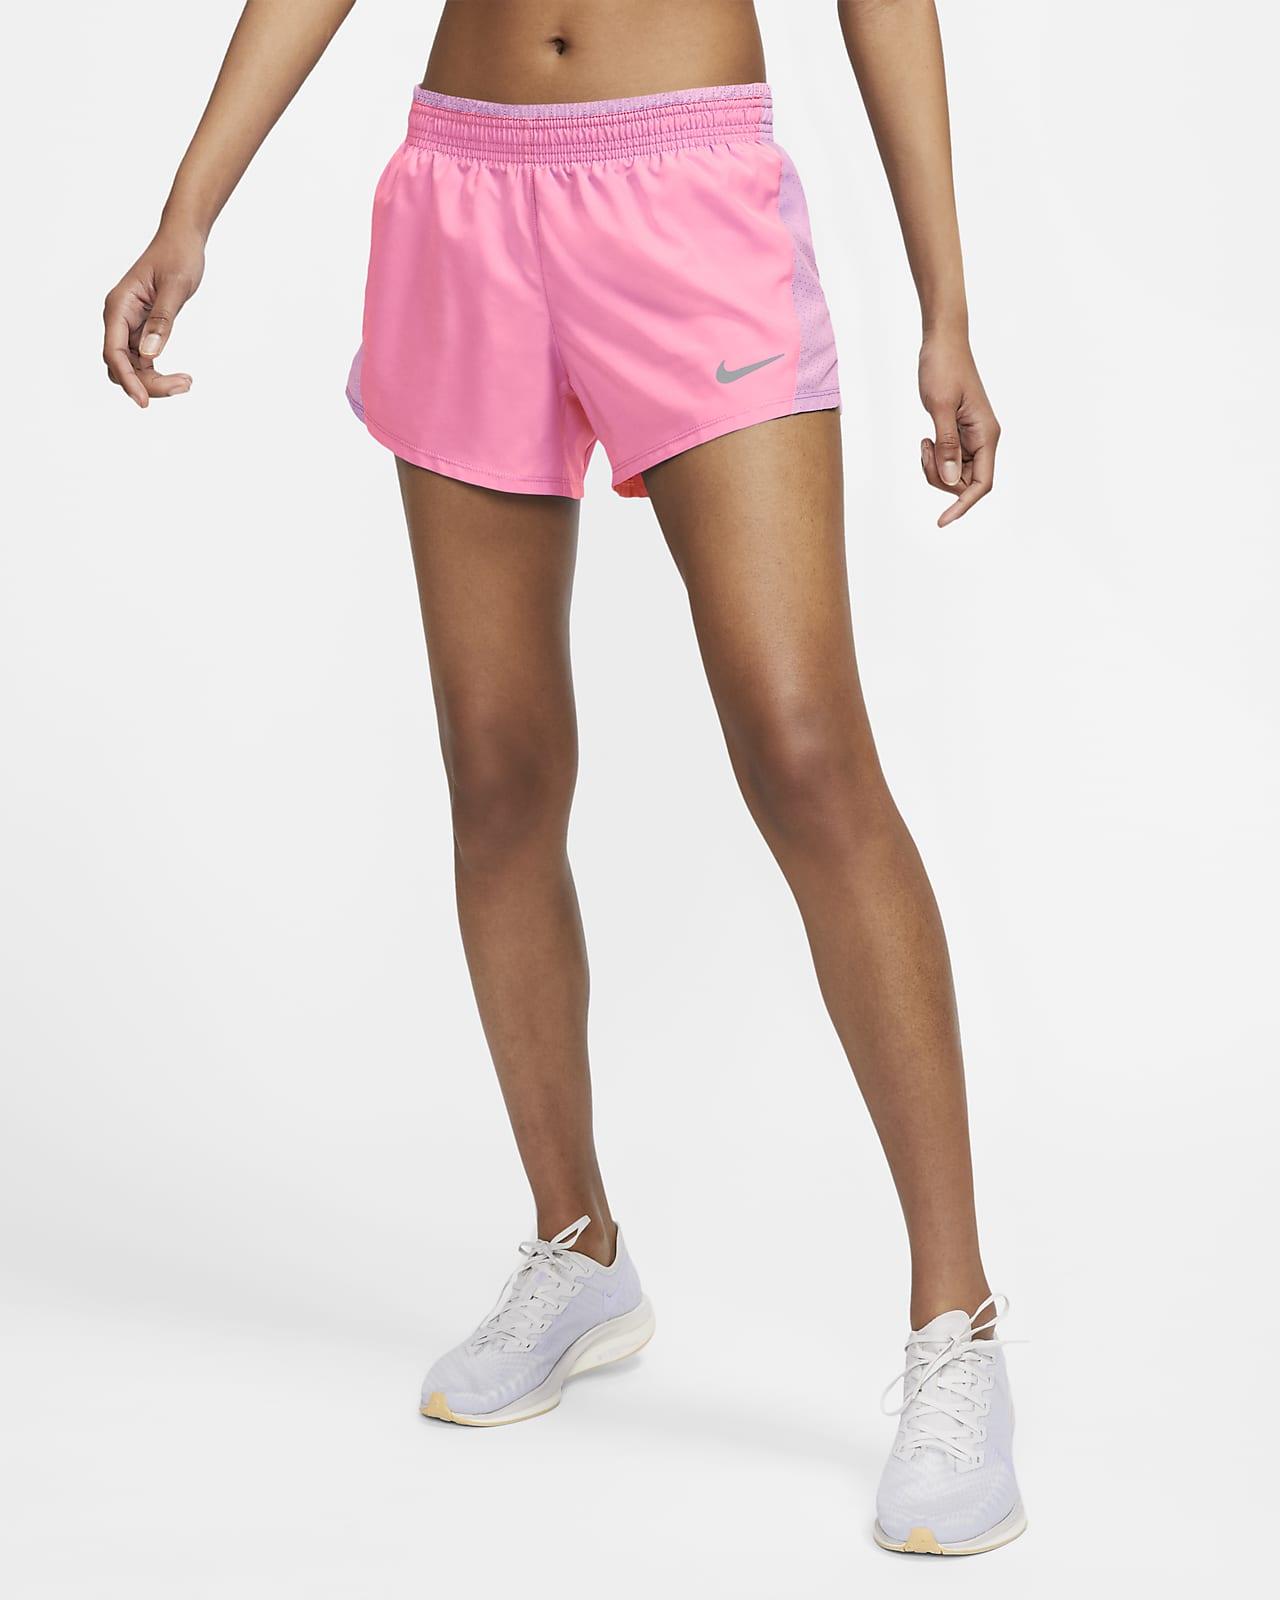 Shorts de running para mujer Nike 10K